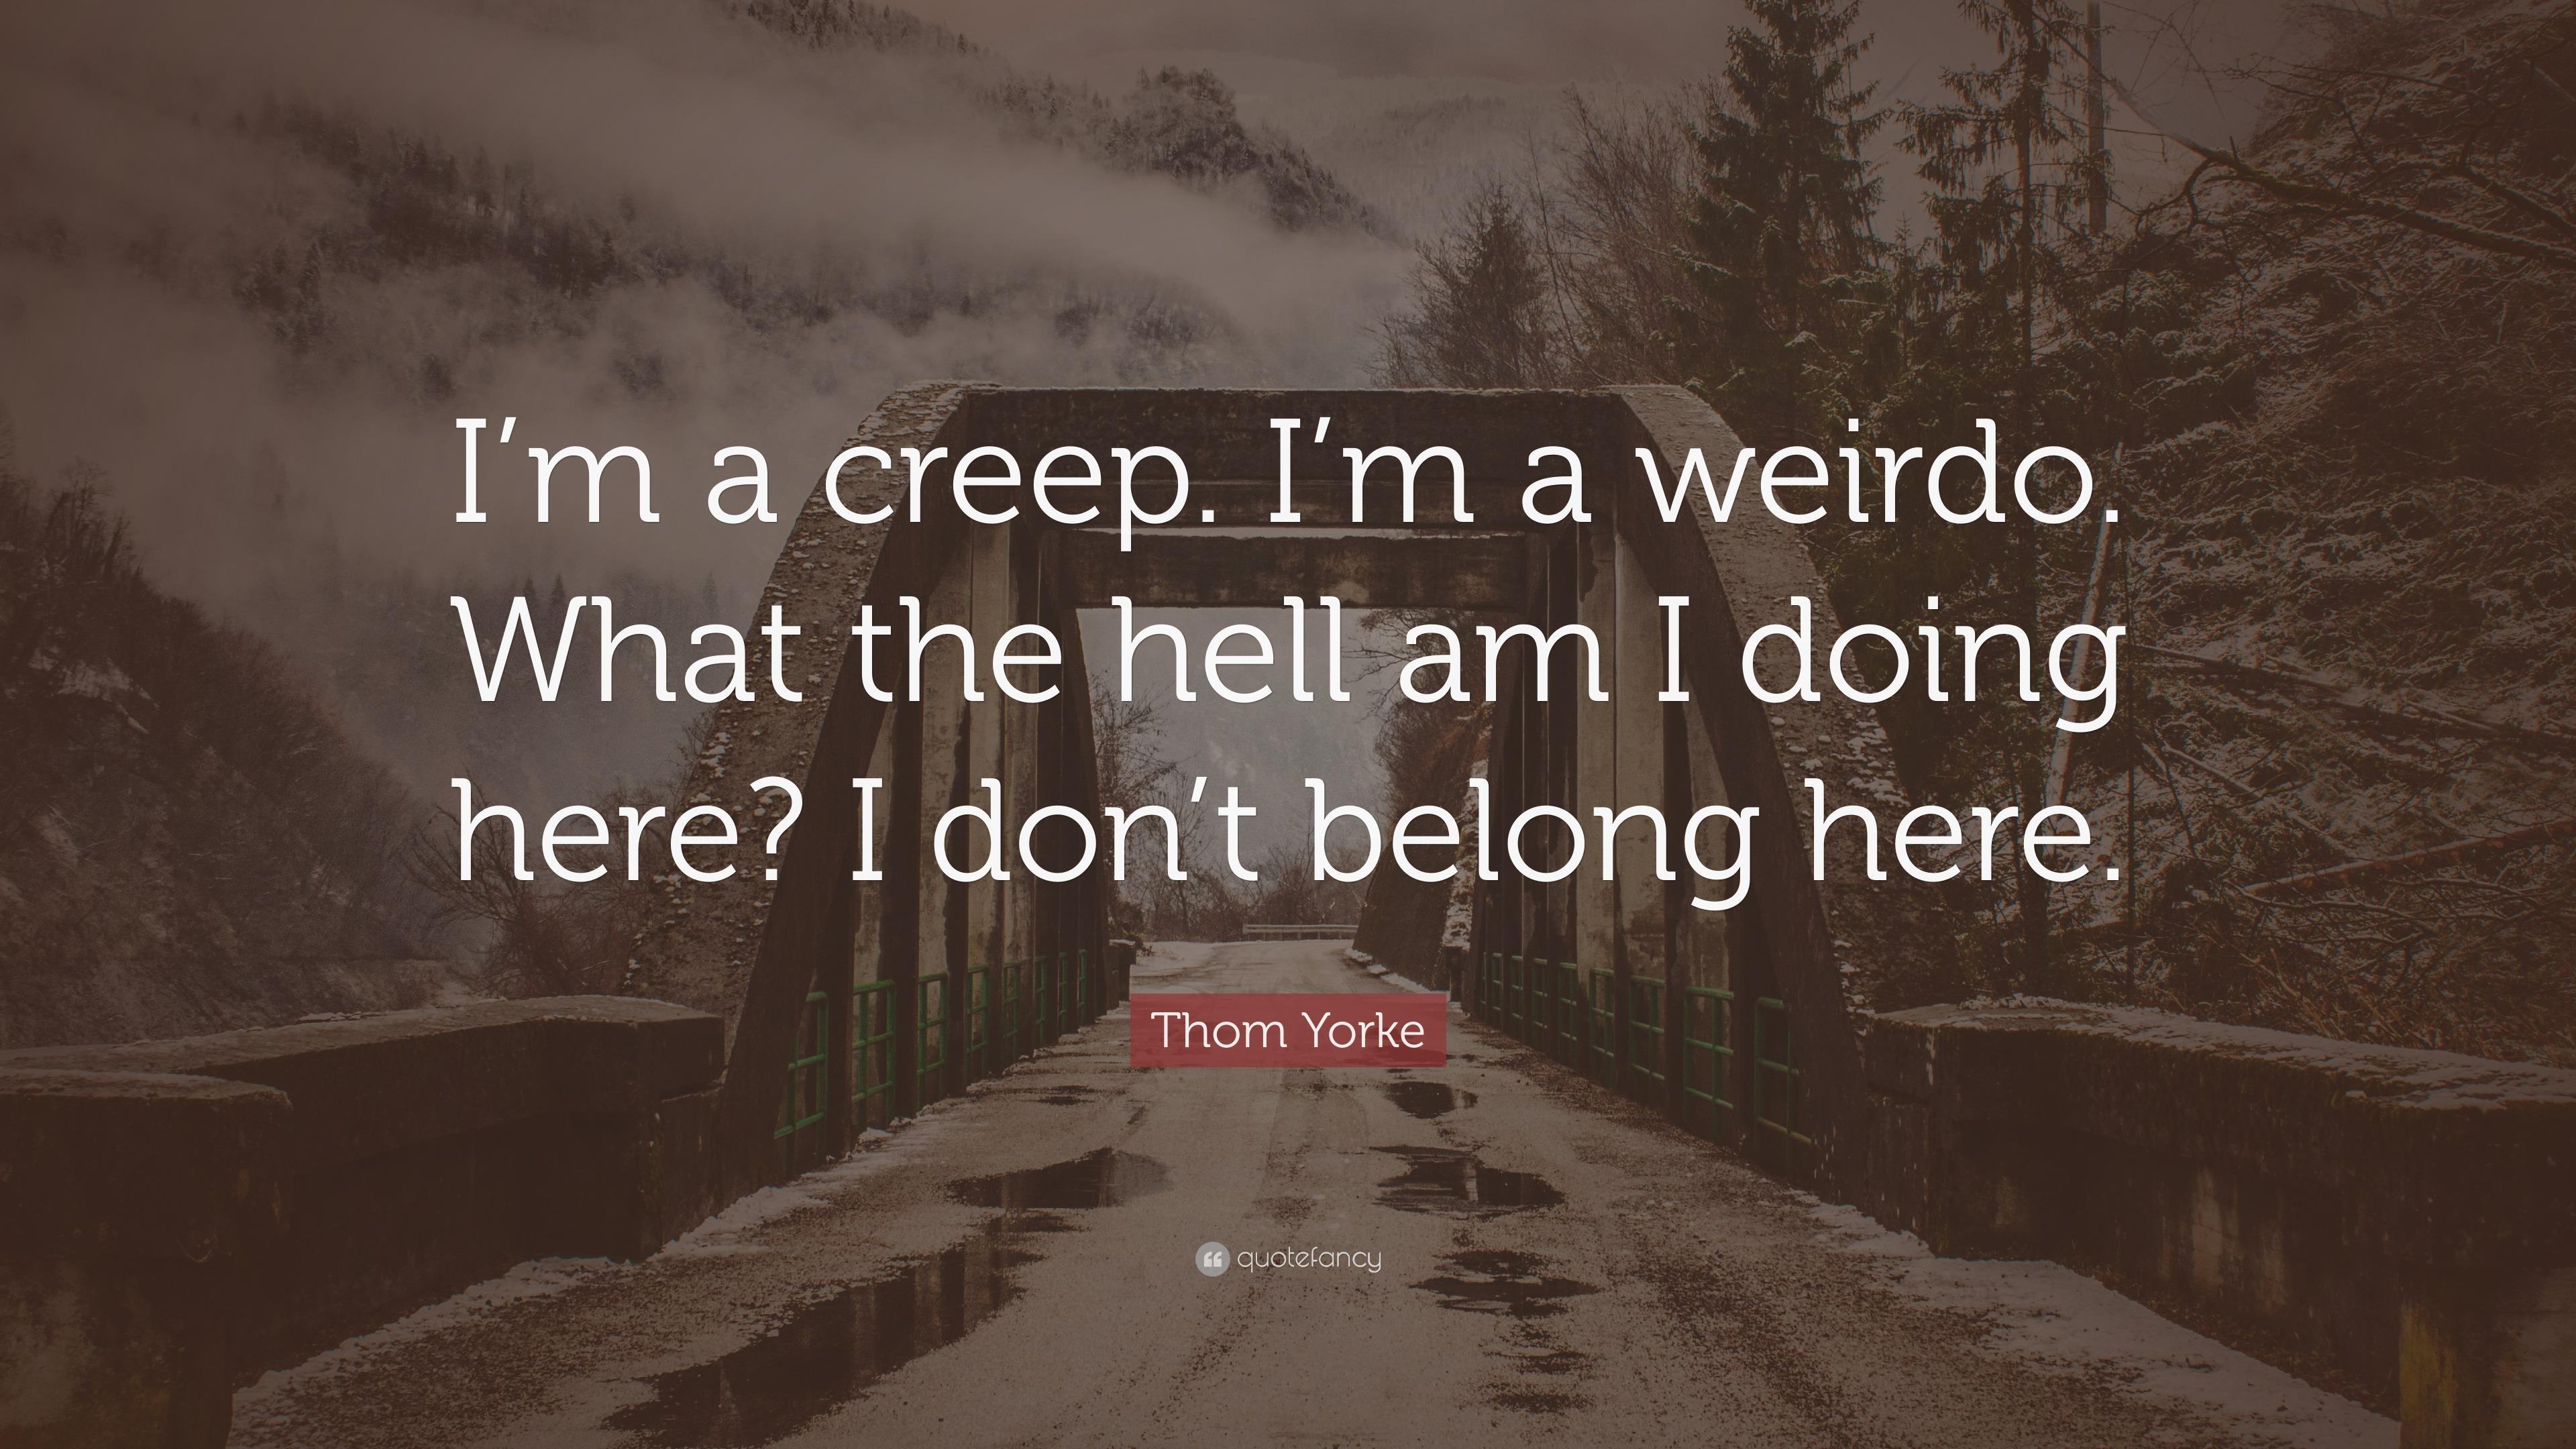 Thom Yorke Quote Im A Creep Im A Weirdo What The Hell Am I